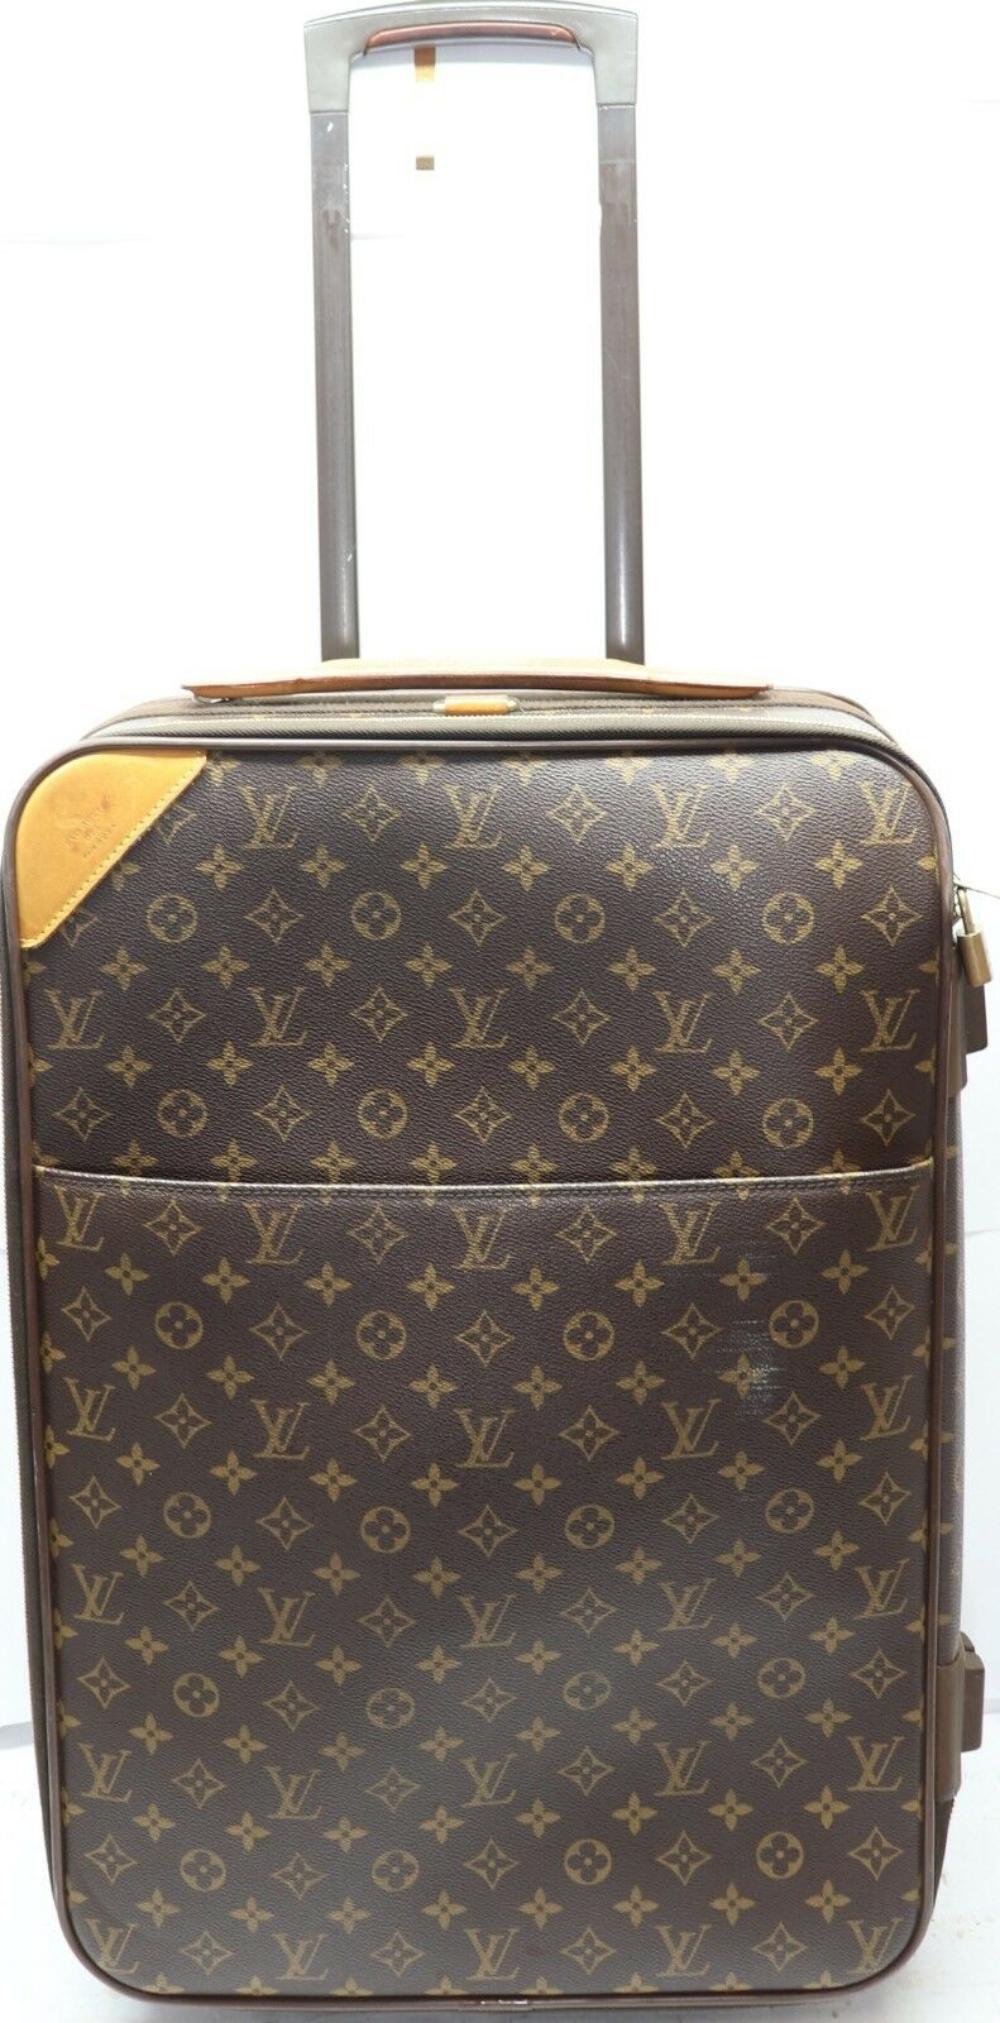 Louis Vuitton Monogram Pegase 55 Travel Carry On Bag